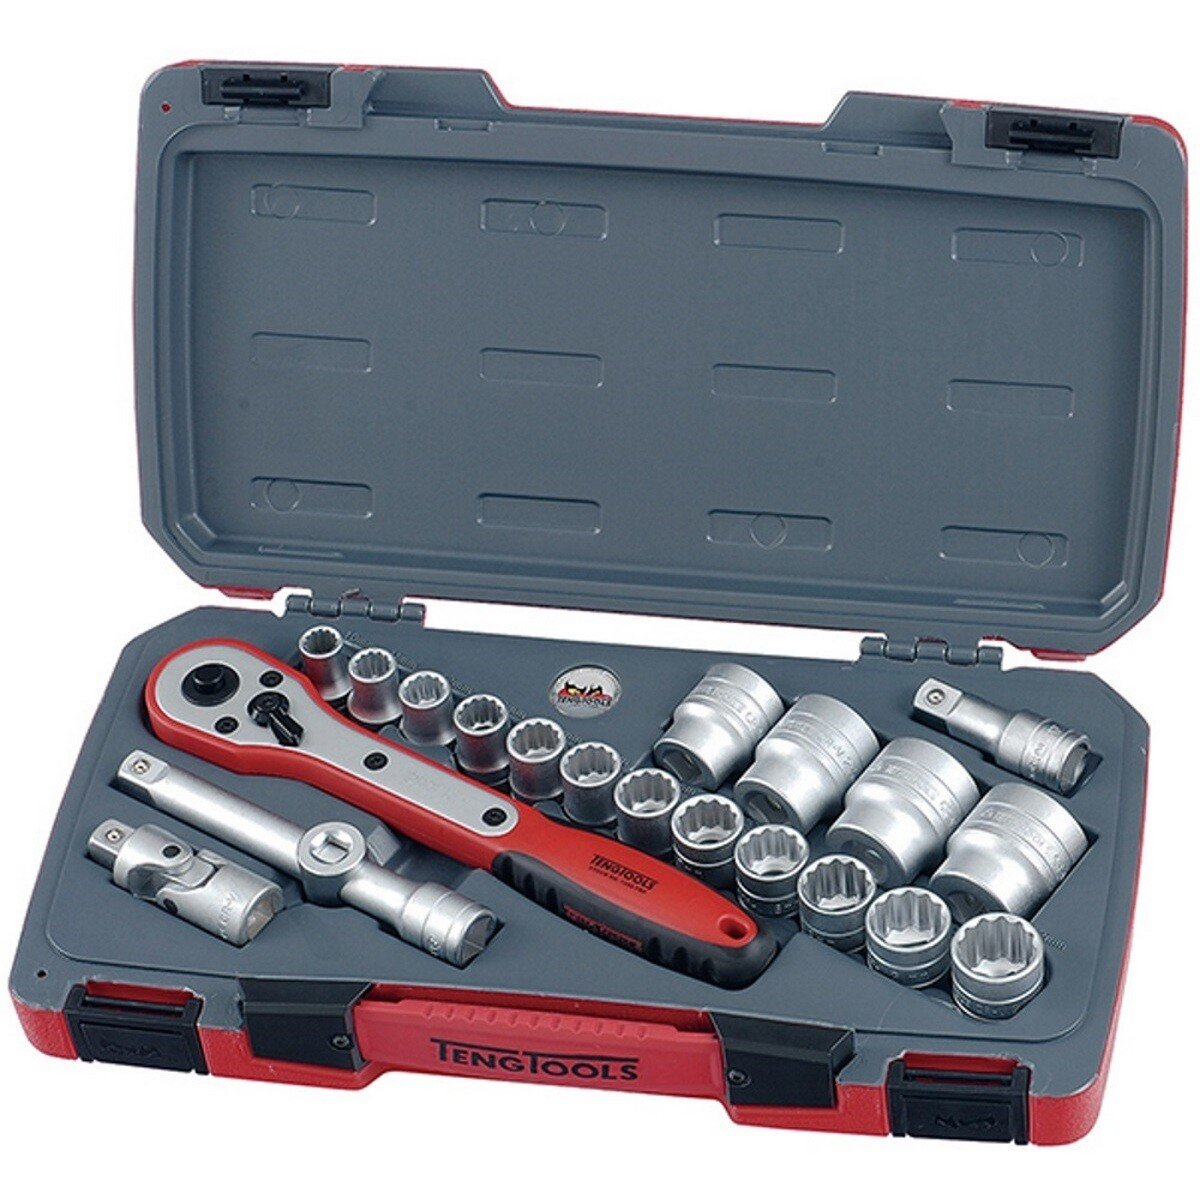 "Teng Tools T1221 Metric Socket Set 21 piece 1/2"" Drive TENT1221"